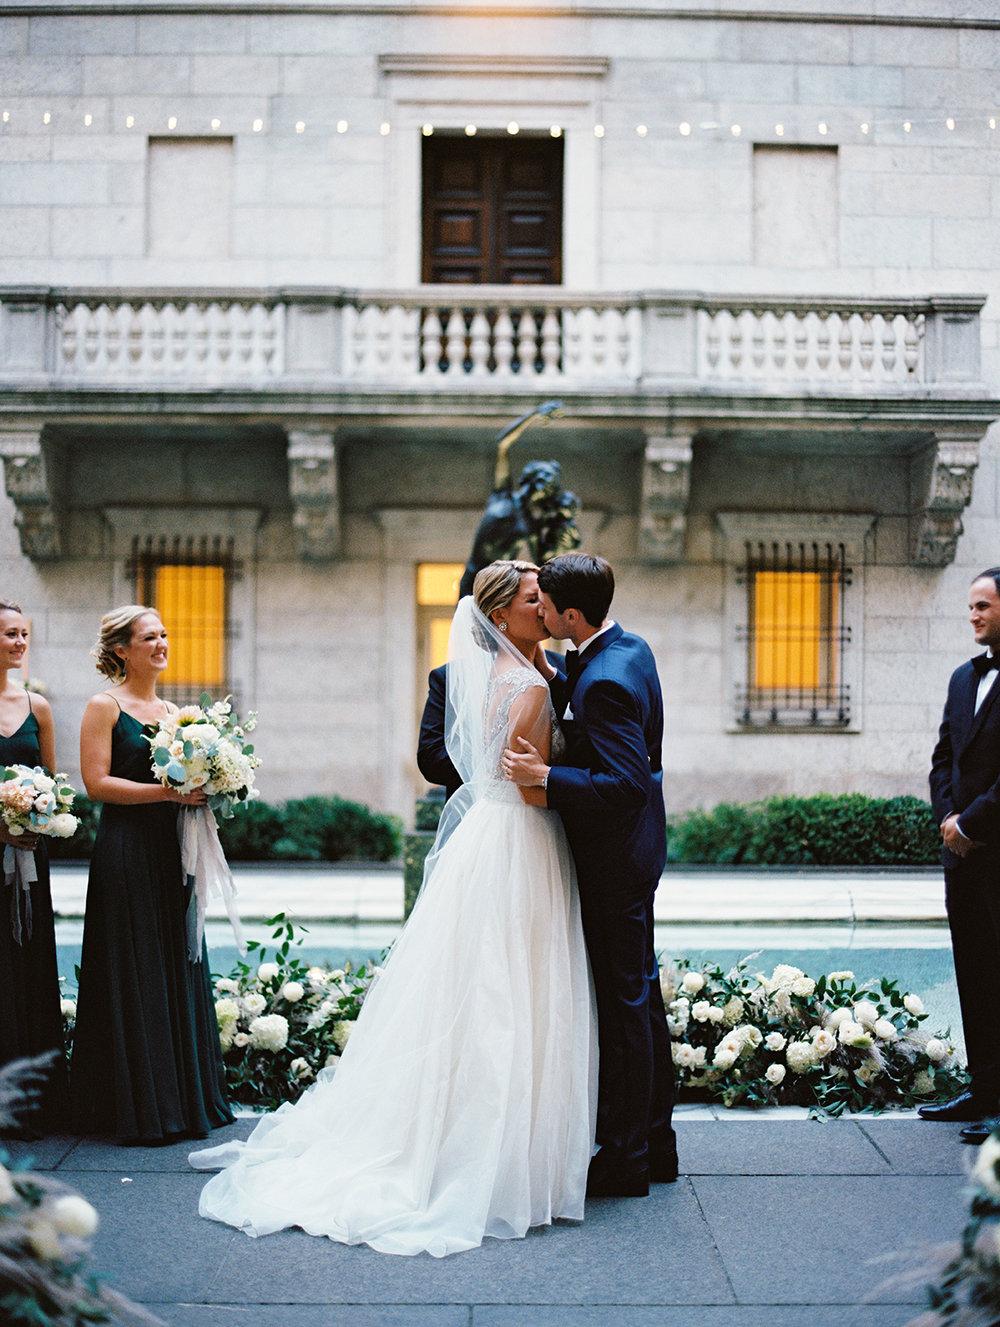 534-andrew-megan-boston-public-library-wedding-film-photographer.jpg